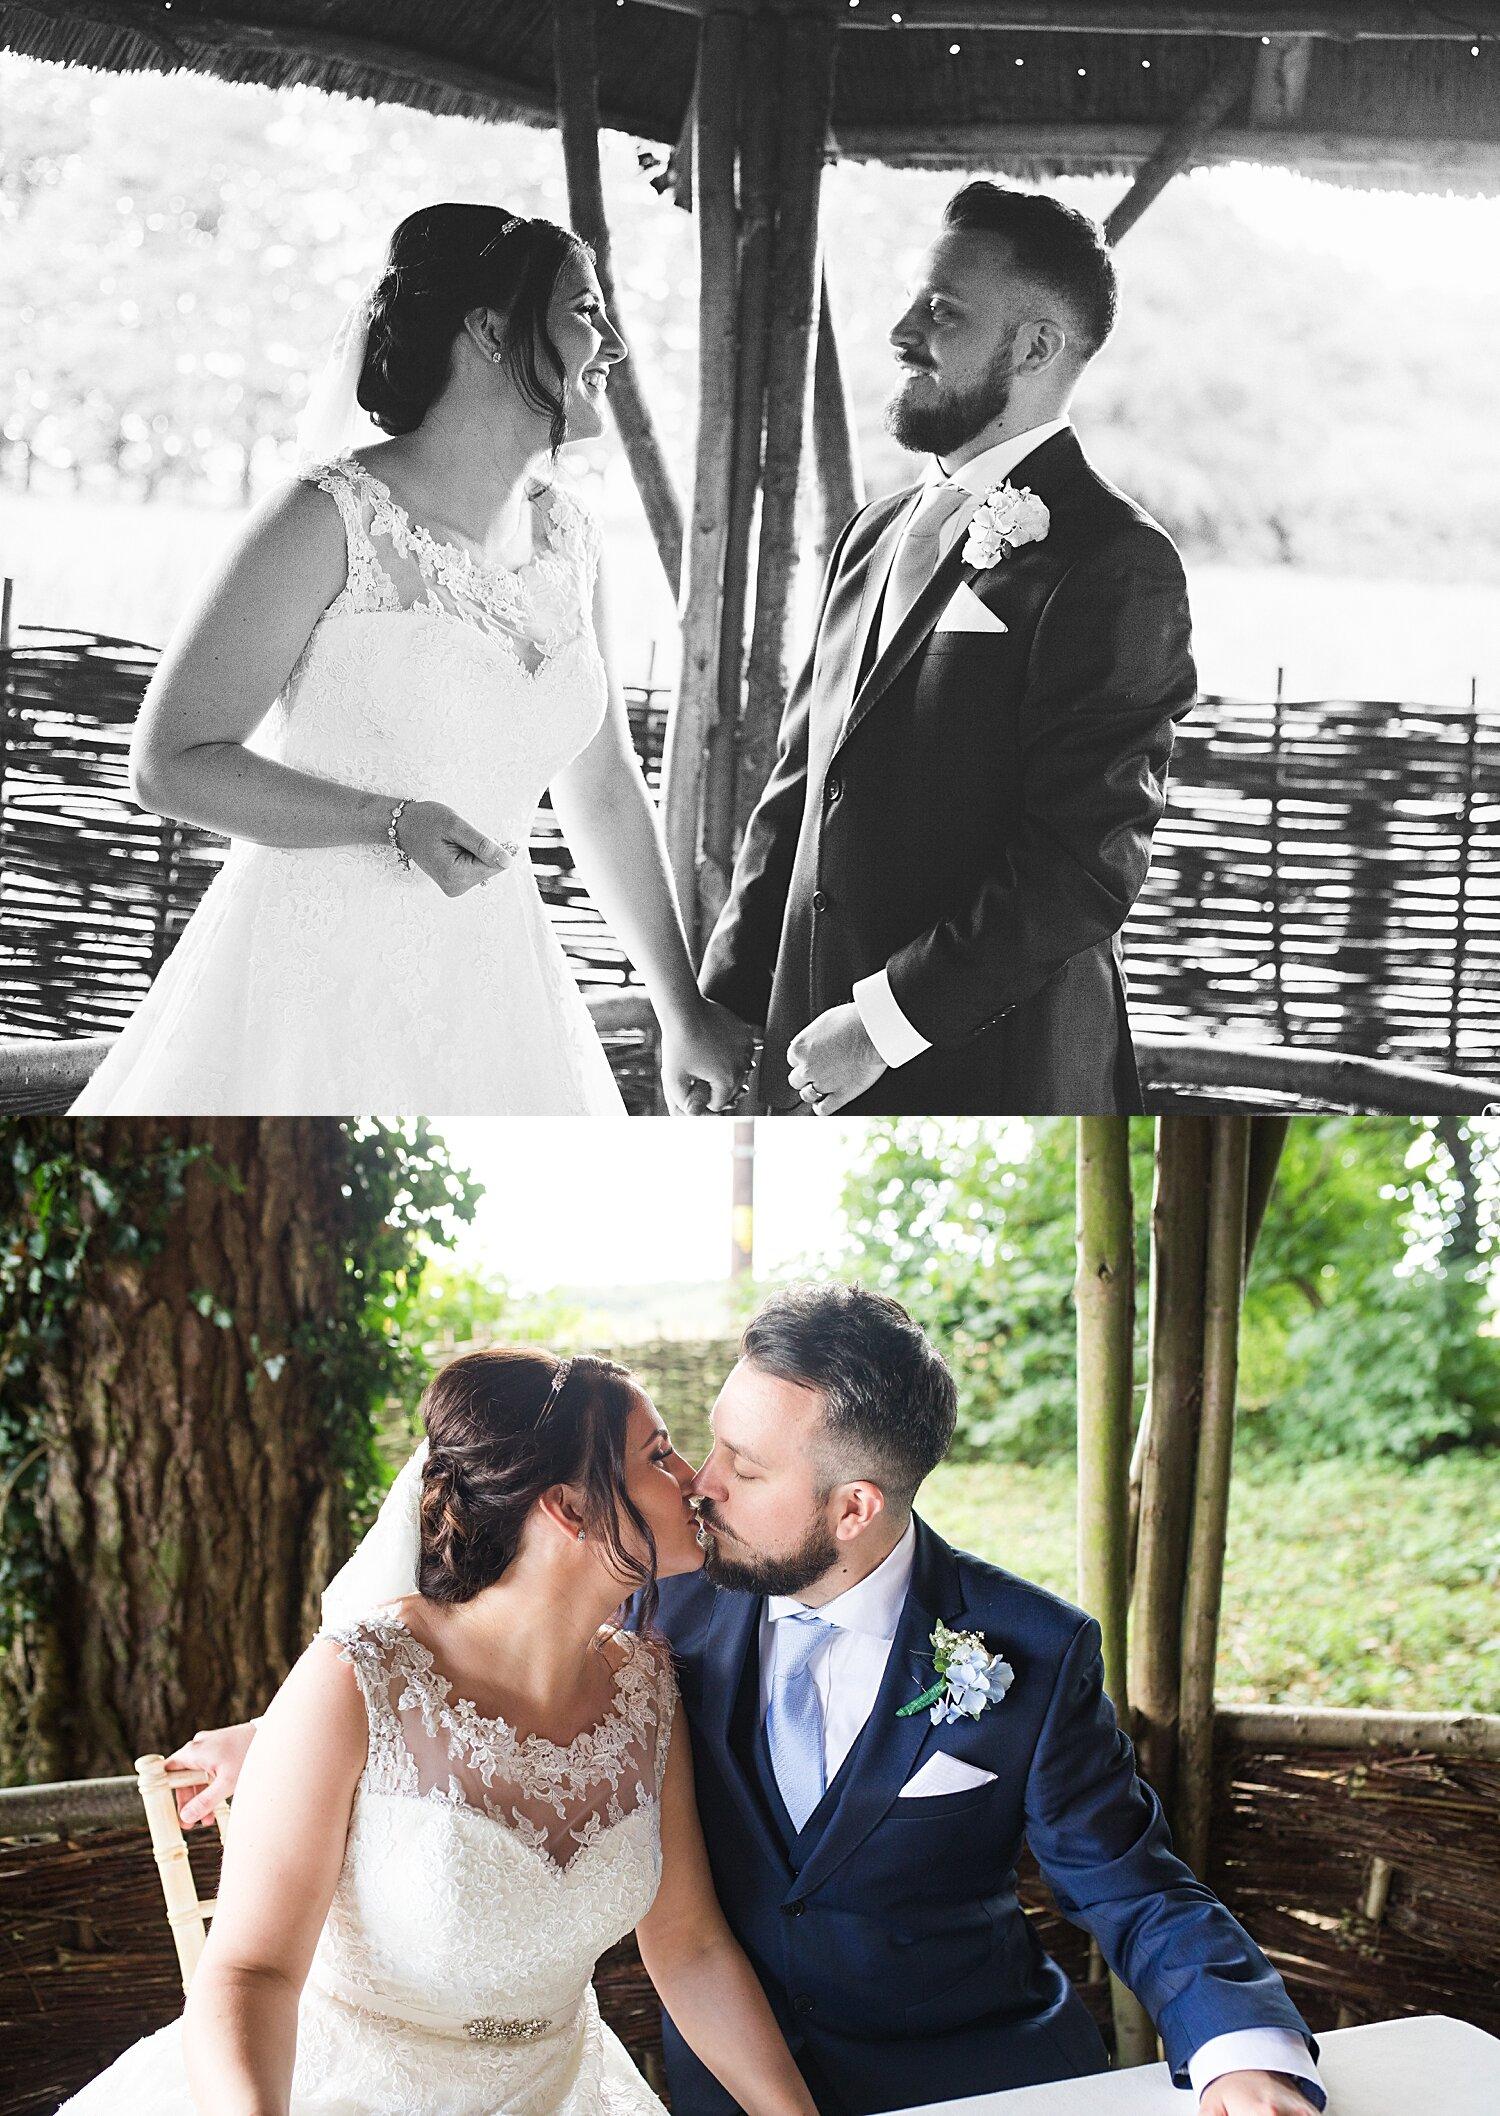 The BarnYard - Kent Wedding Photographer - Carla Guest Photography_0033.jpg